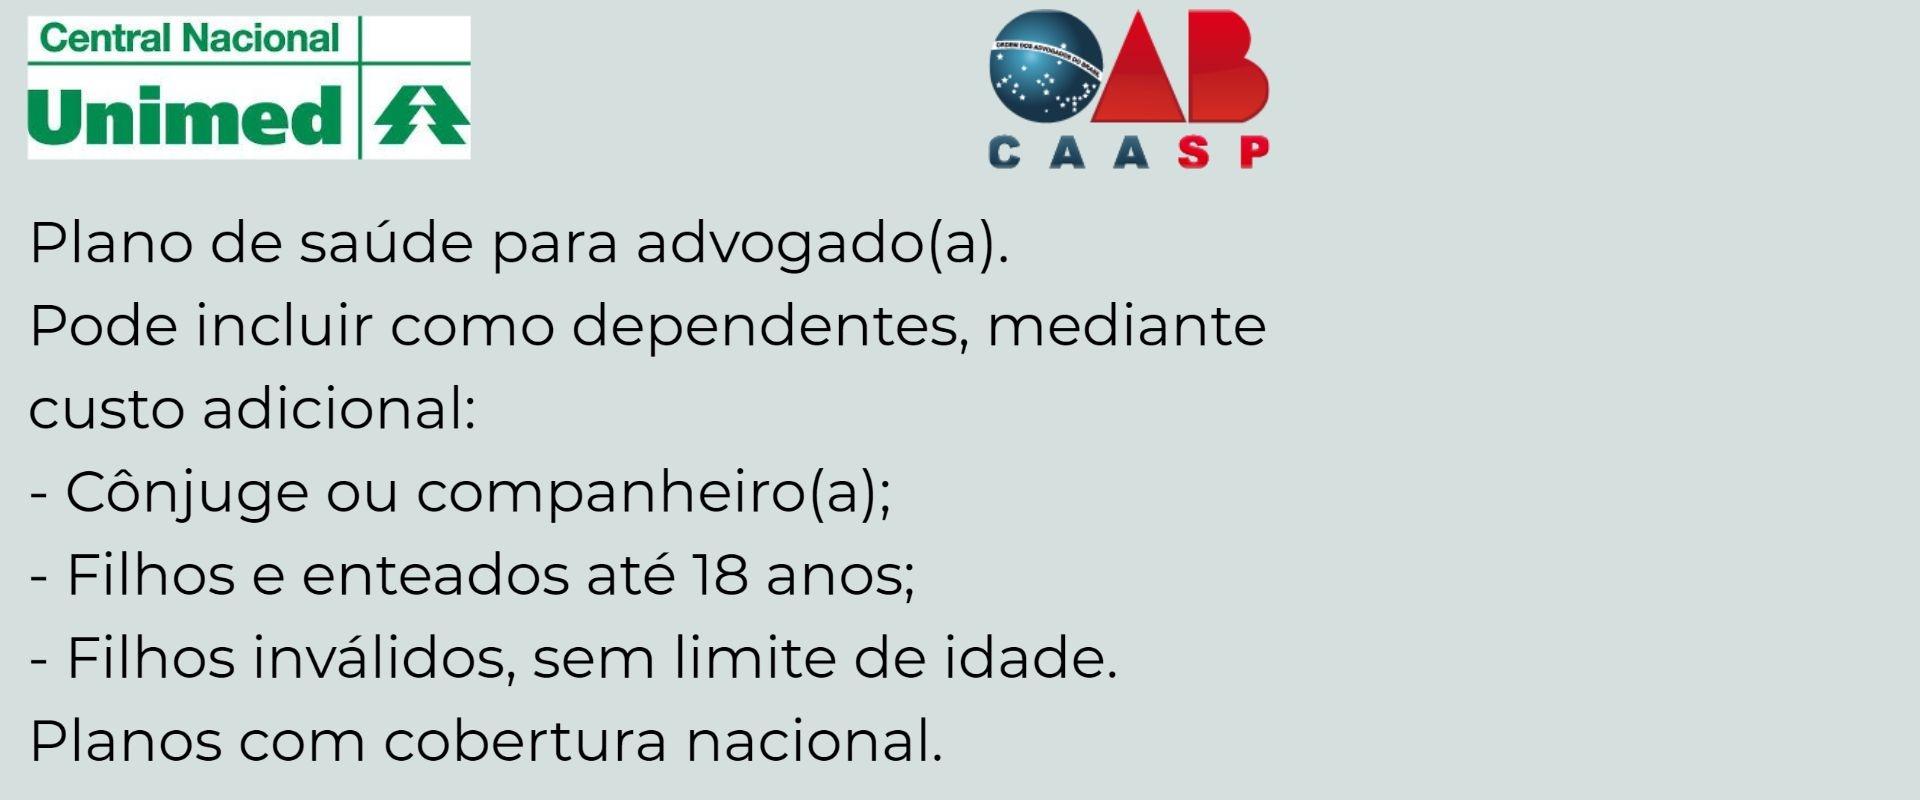 Unimed CAASP Caraguatatuba